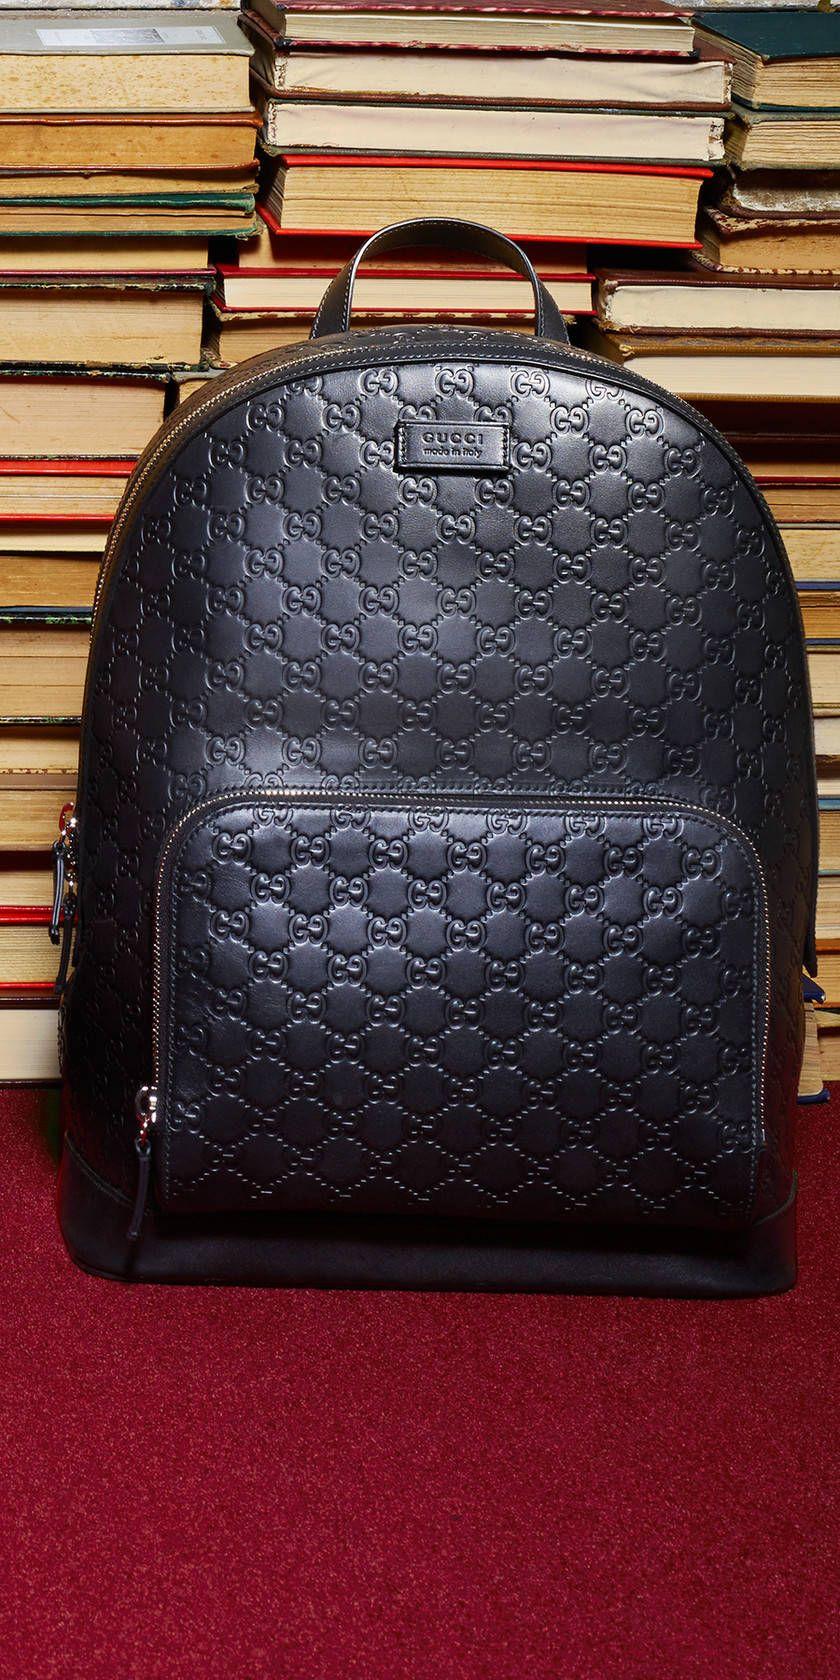 Gucci Signature leather backpack Leather Backpacks c7e56b259e8f0